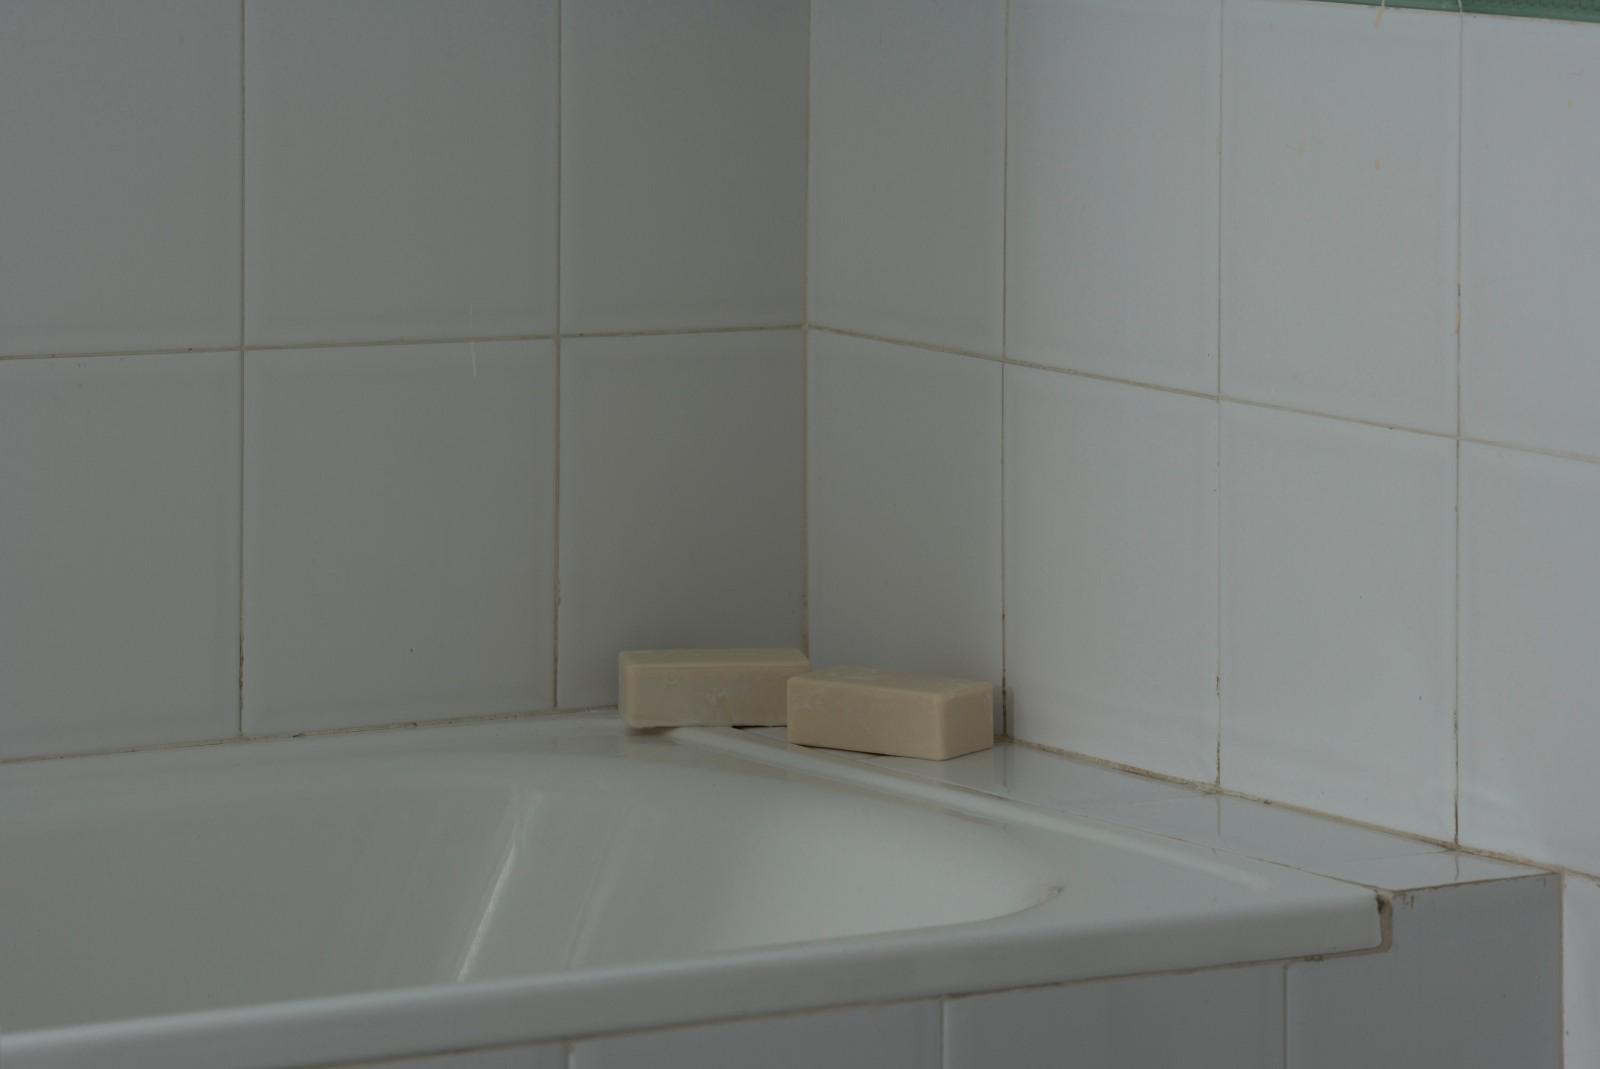 no soap, 2008, C-print, 75,5 x 106,5 cm, ed. 5